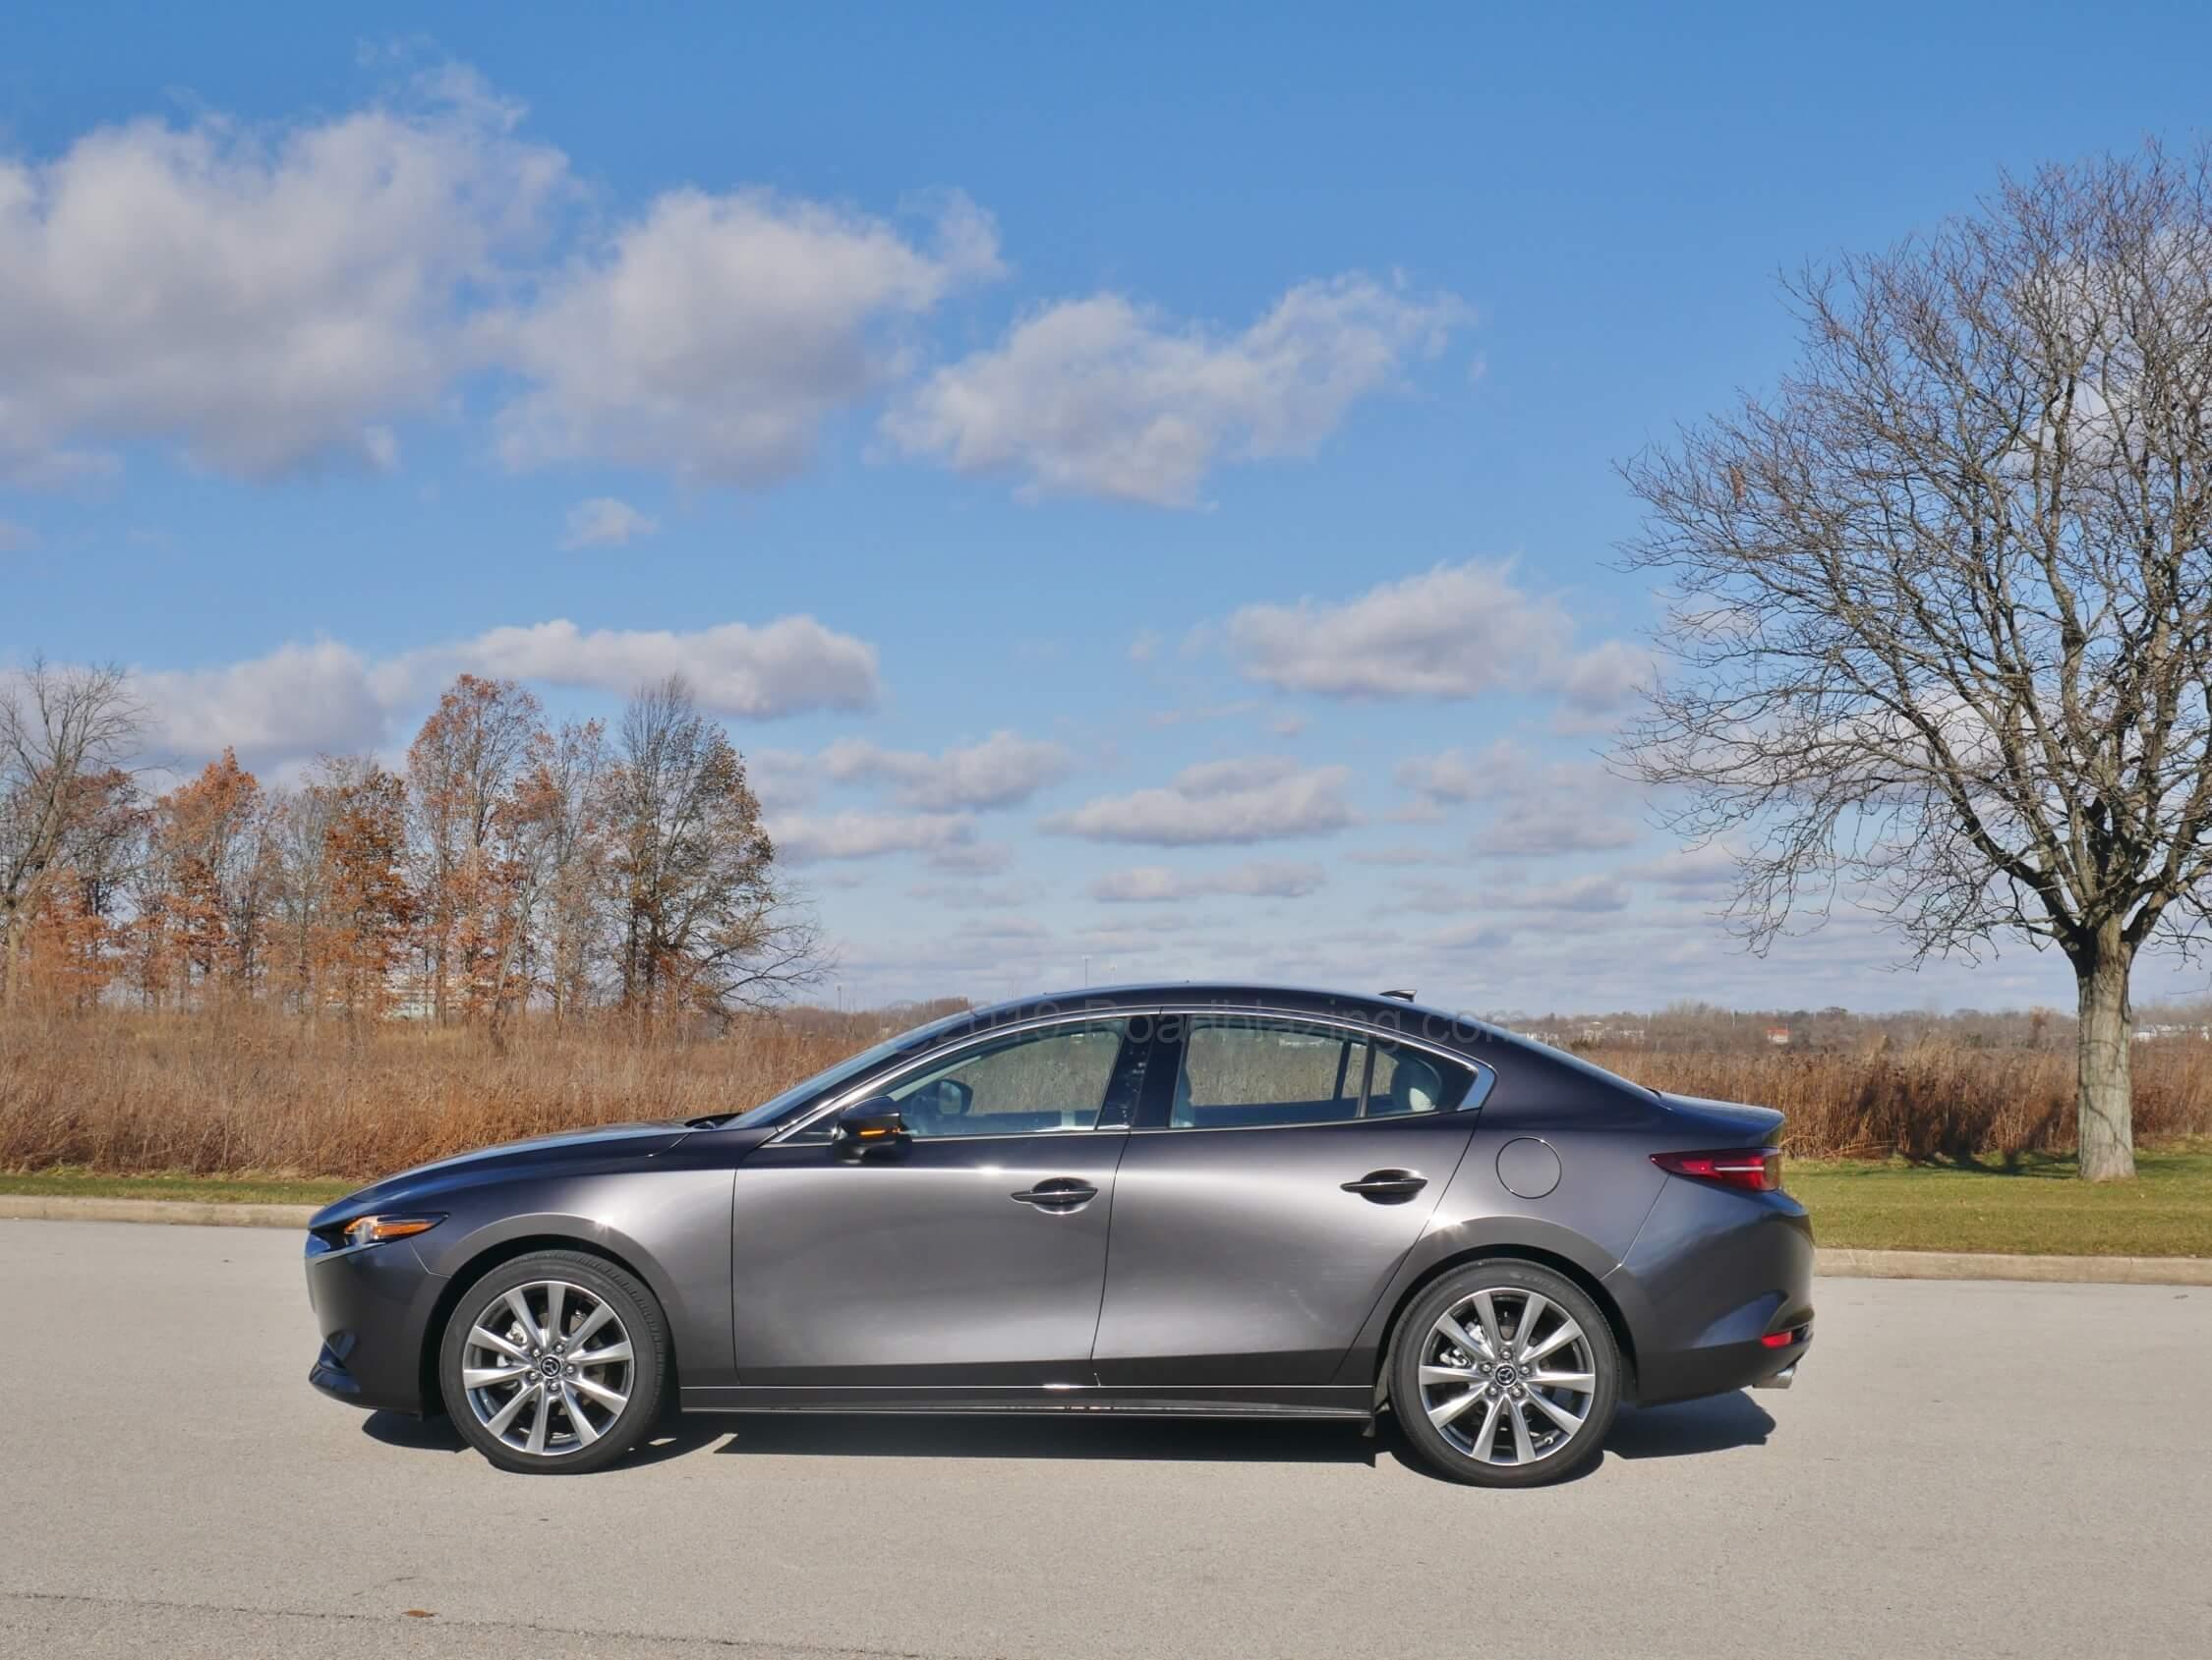 2020 Mazda 3 Sedan AWD - Bottom Line Review | RoadBlazing